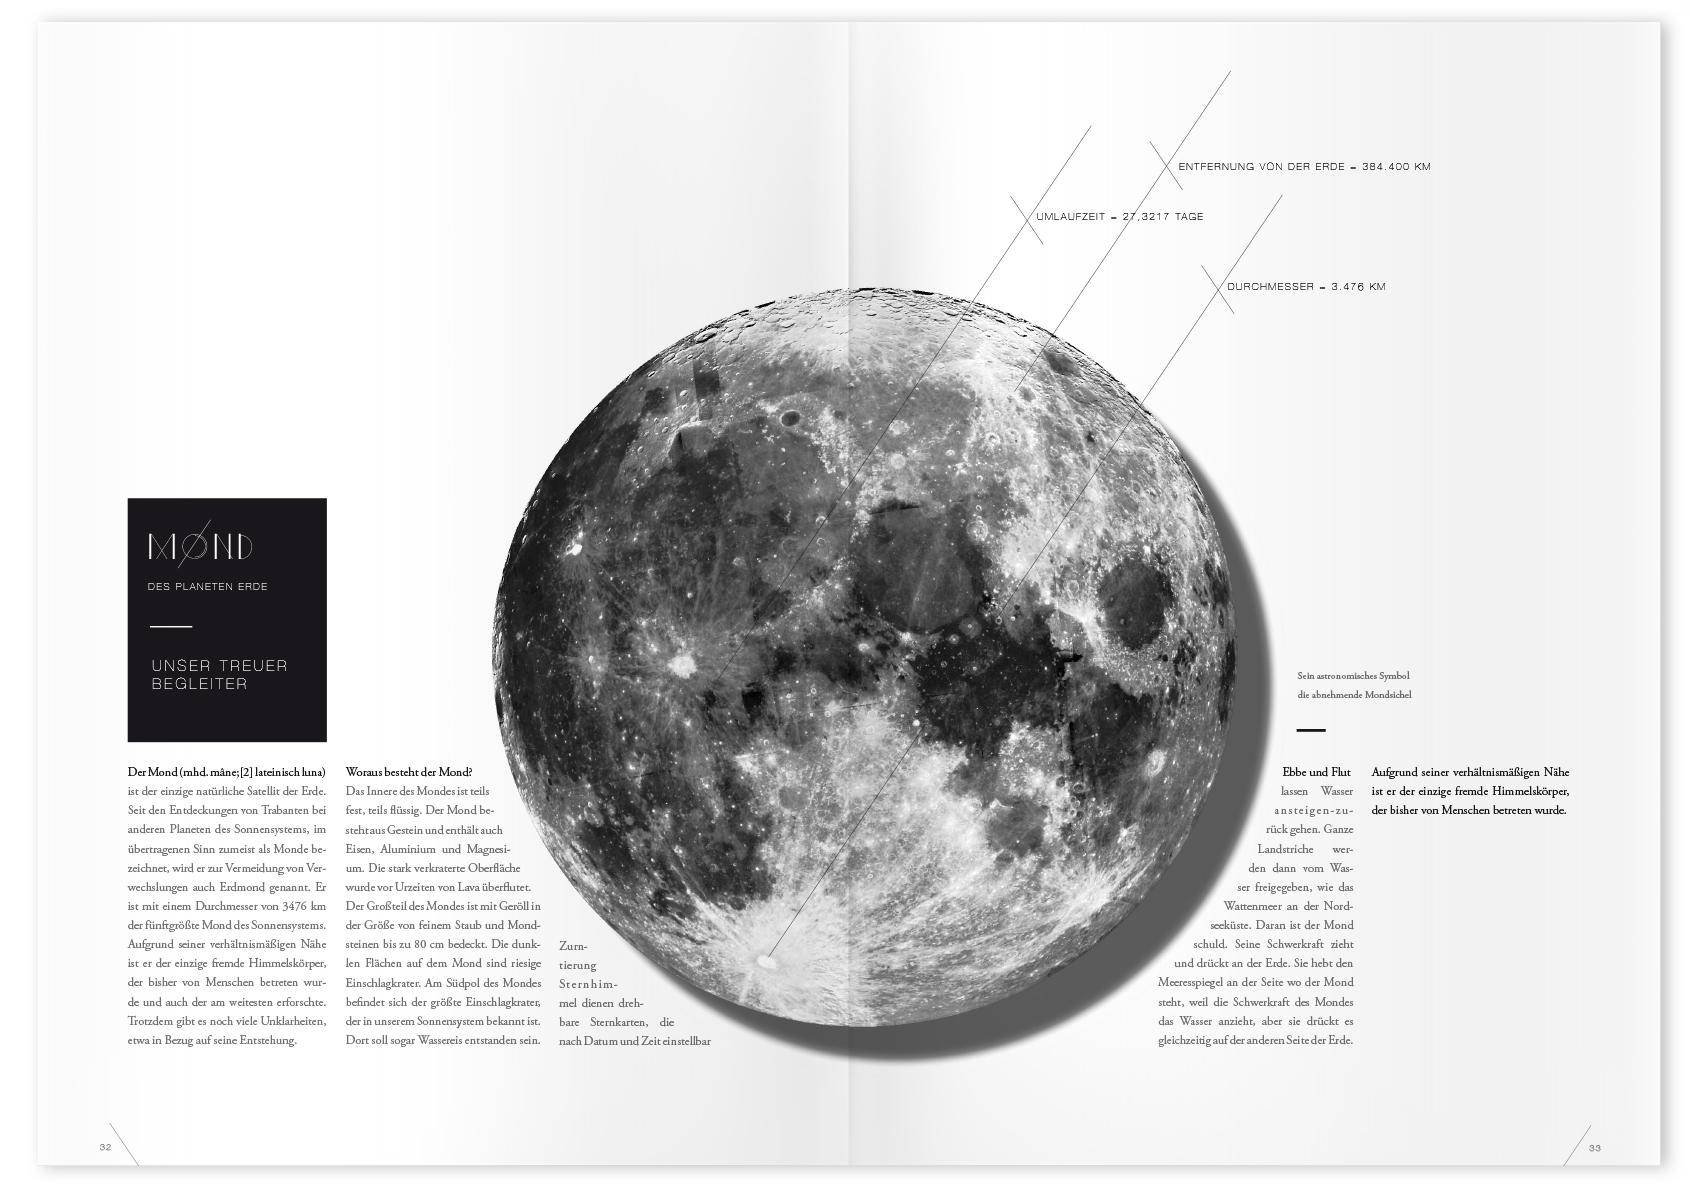 07_Cosmos-Magazin_hsrm-Hochschule-RheinMain_Editorial-Design_Grafikdesign_Gloria-Kison.jpg